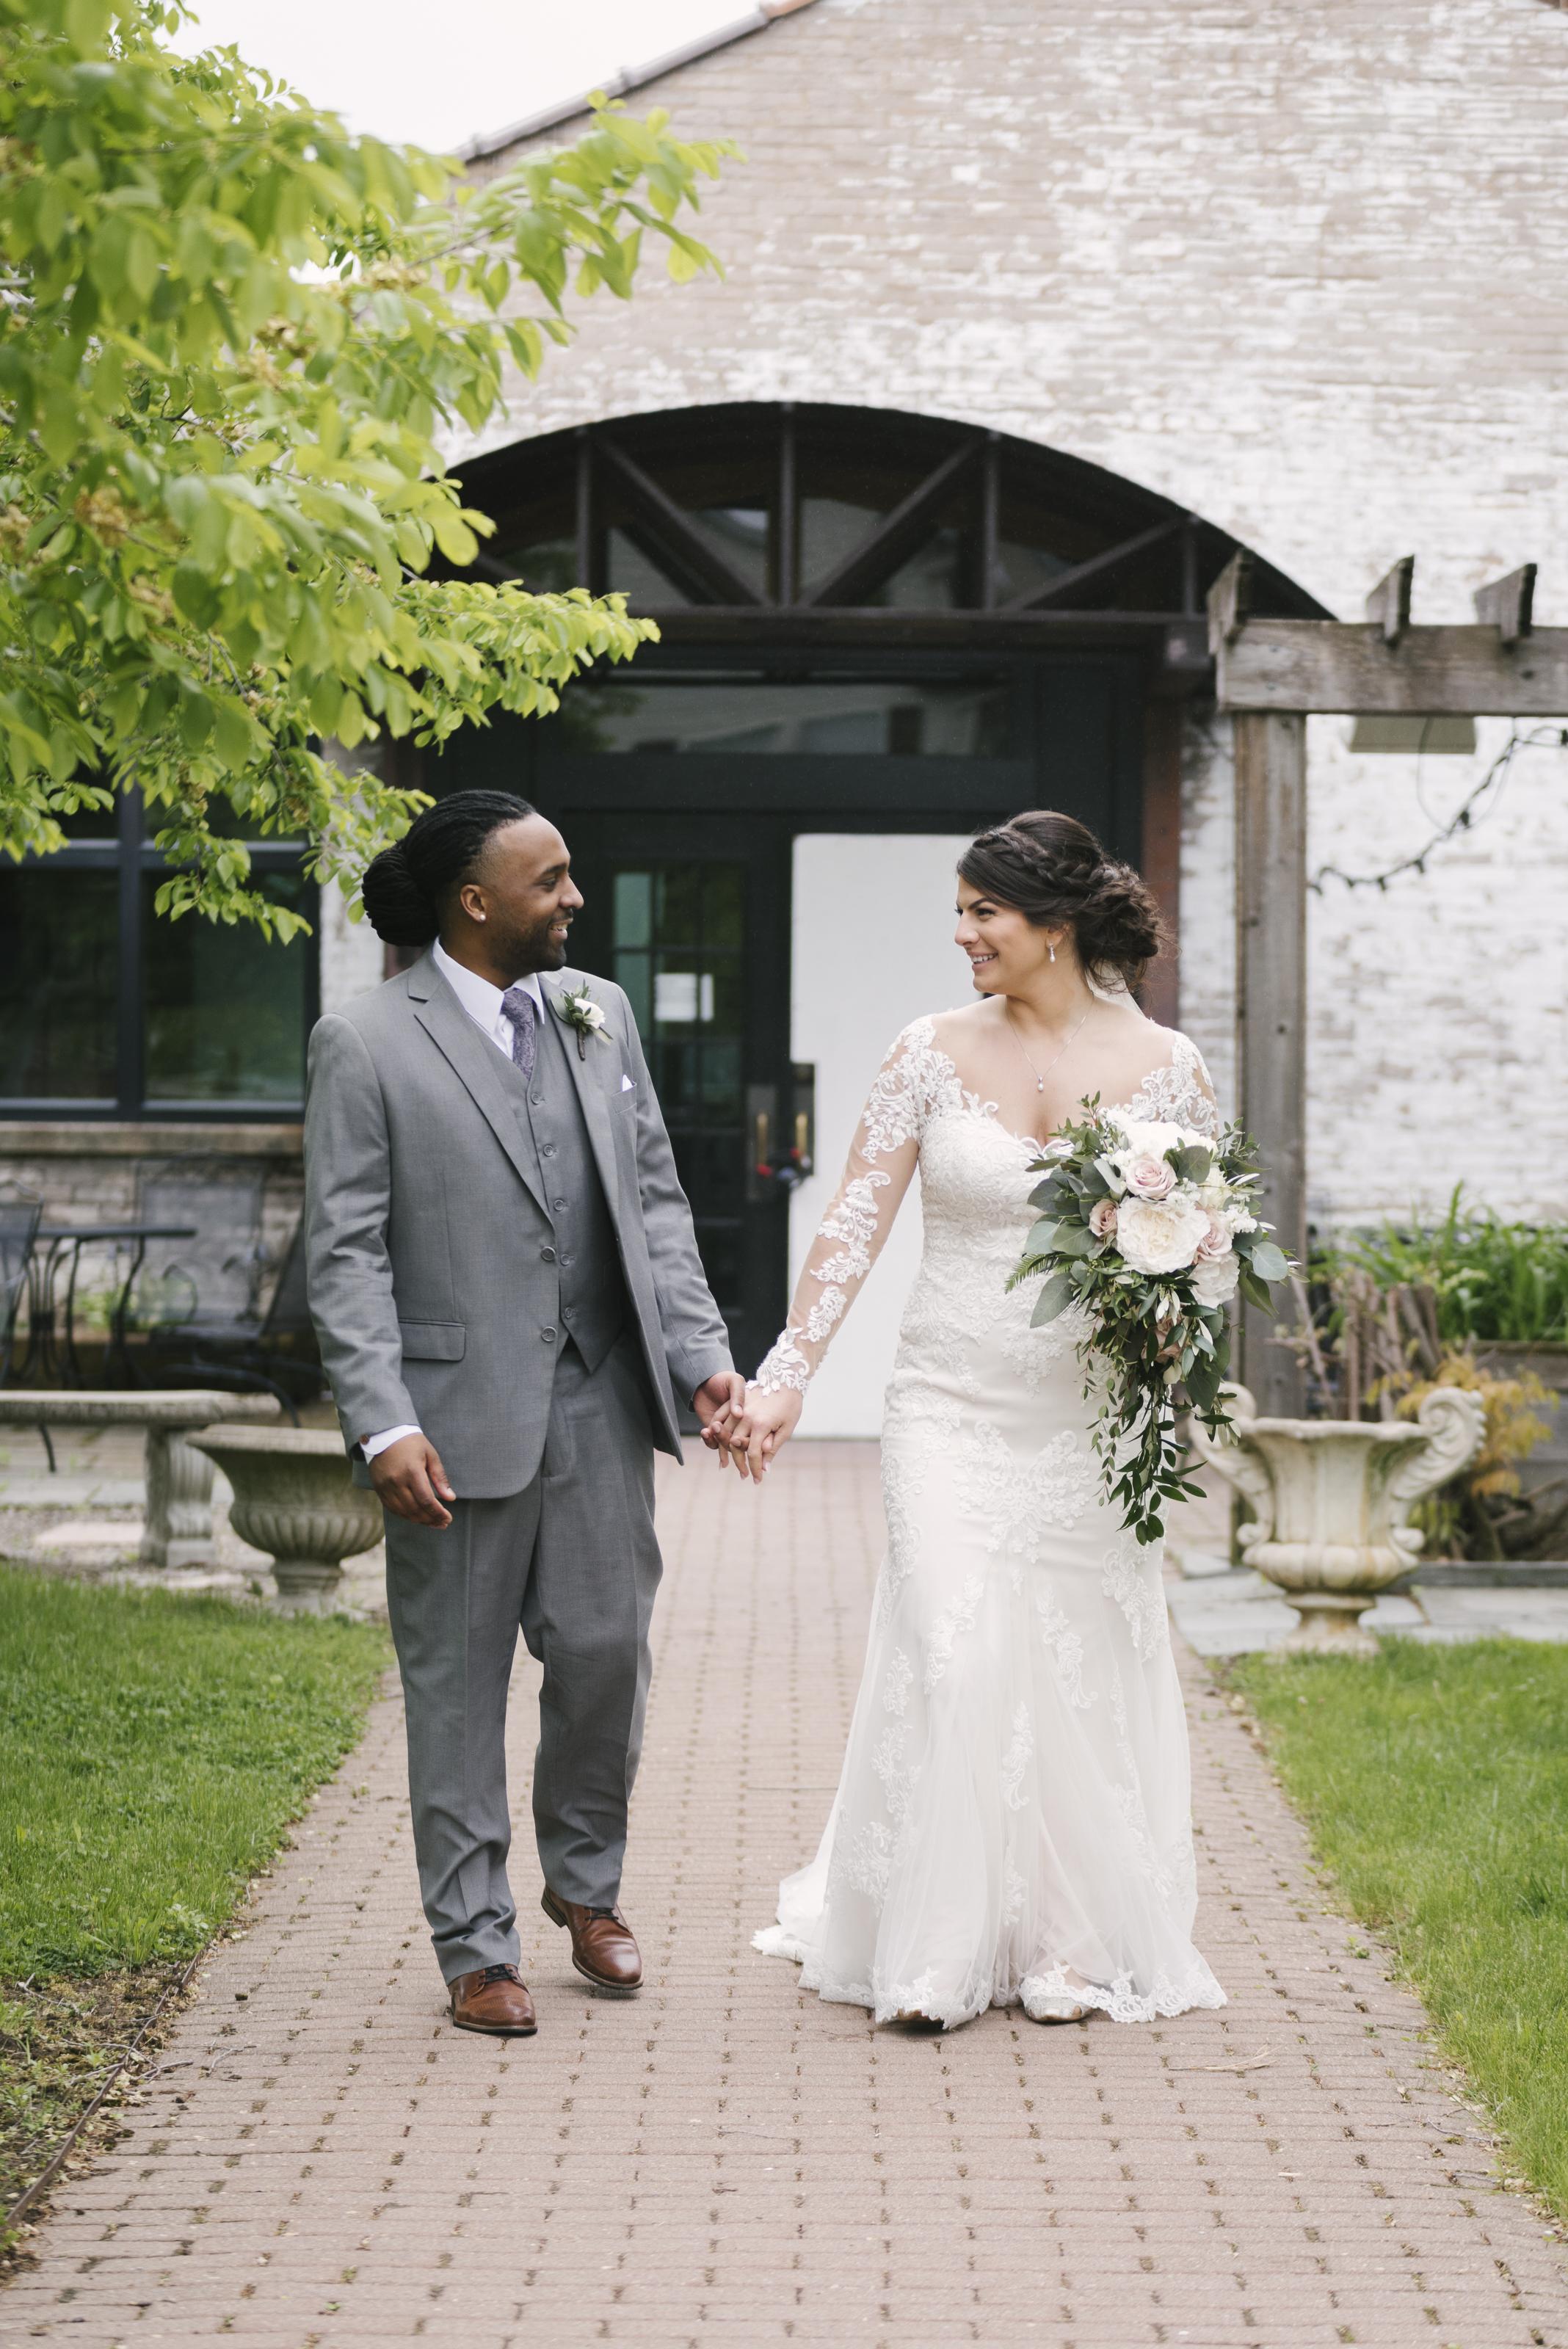 rochester-wedding-photographer-arbor-loft-28.jpg